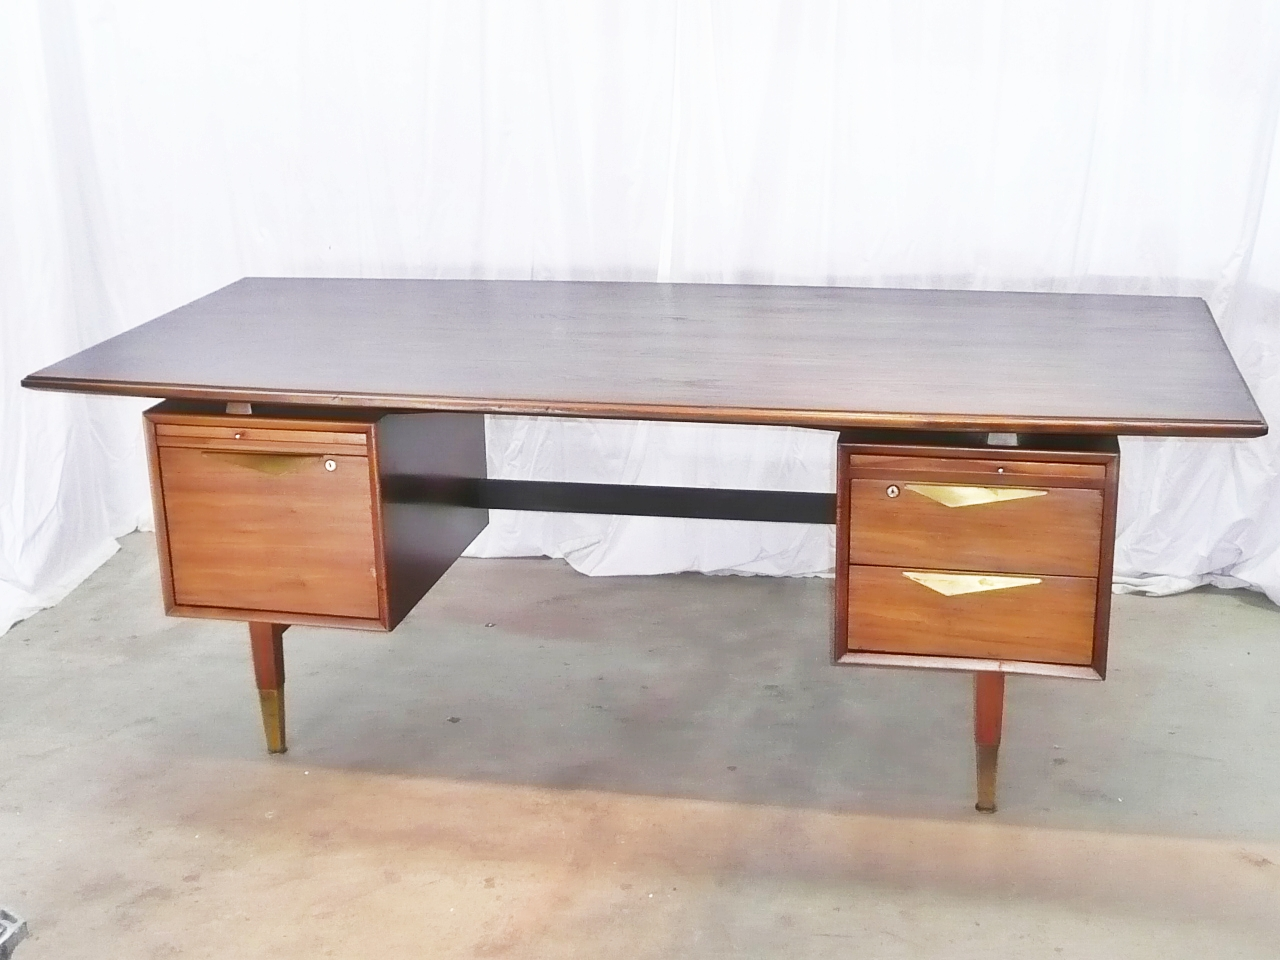 Danish Furniture For Sale Craigslist